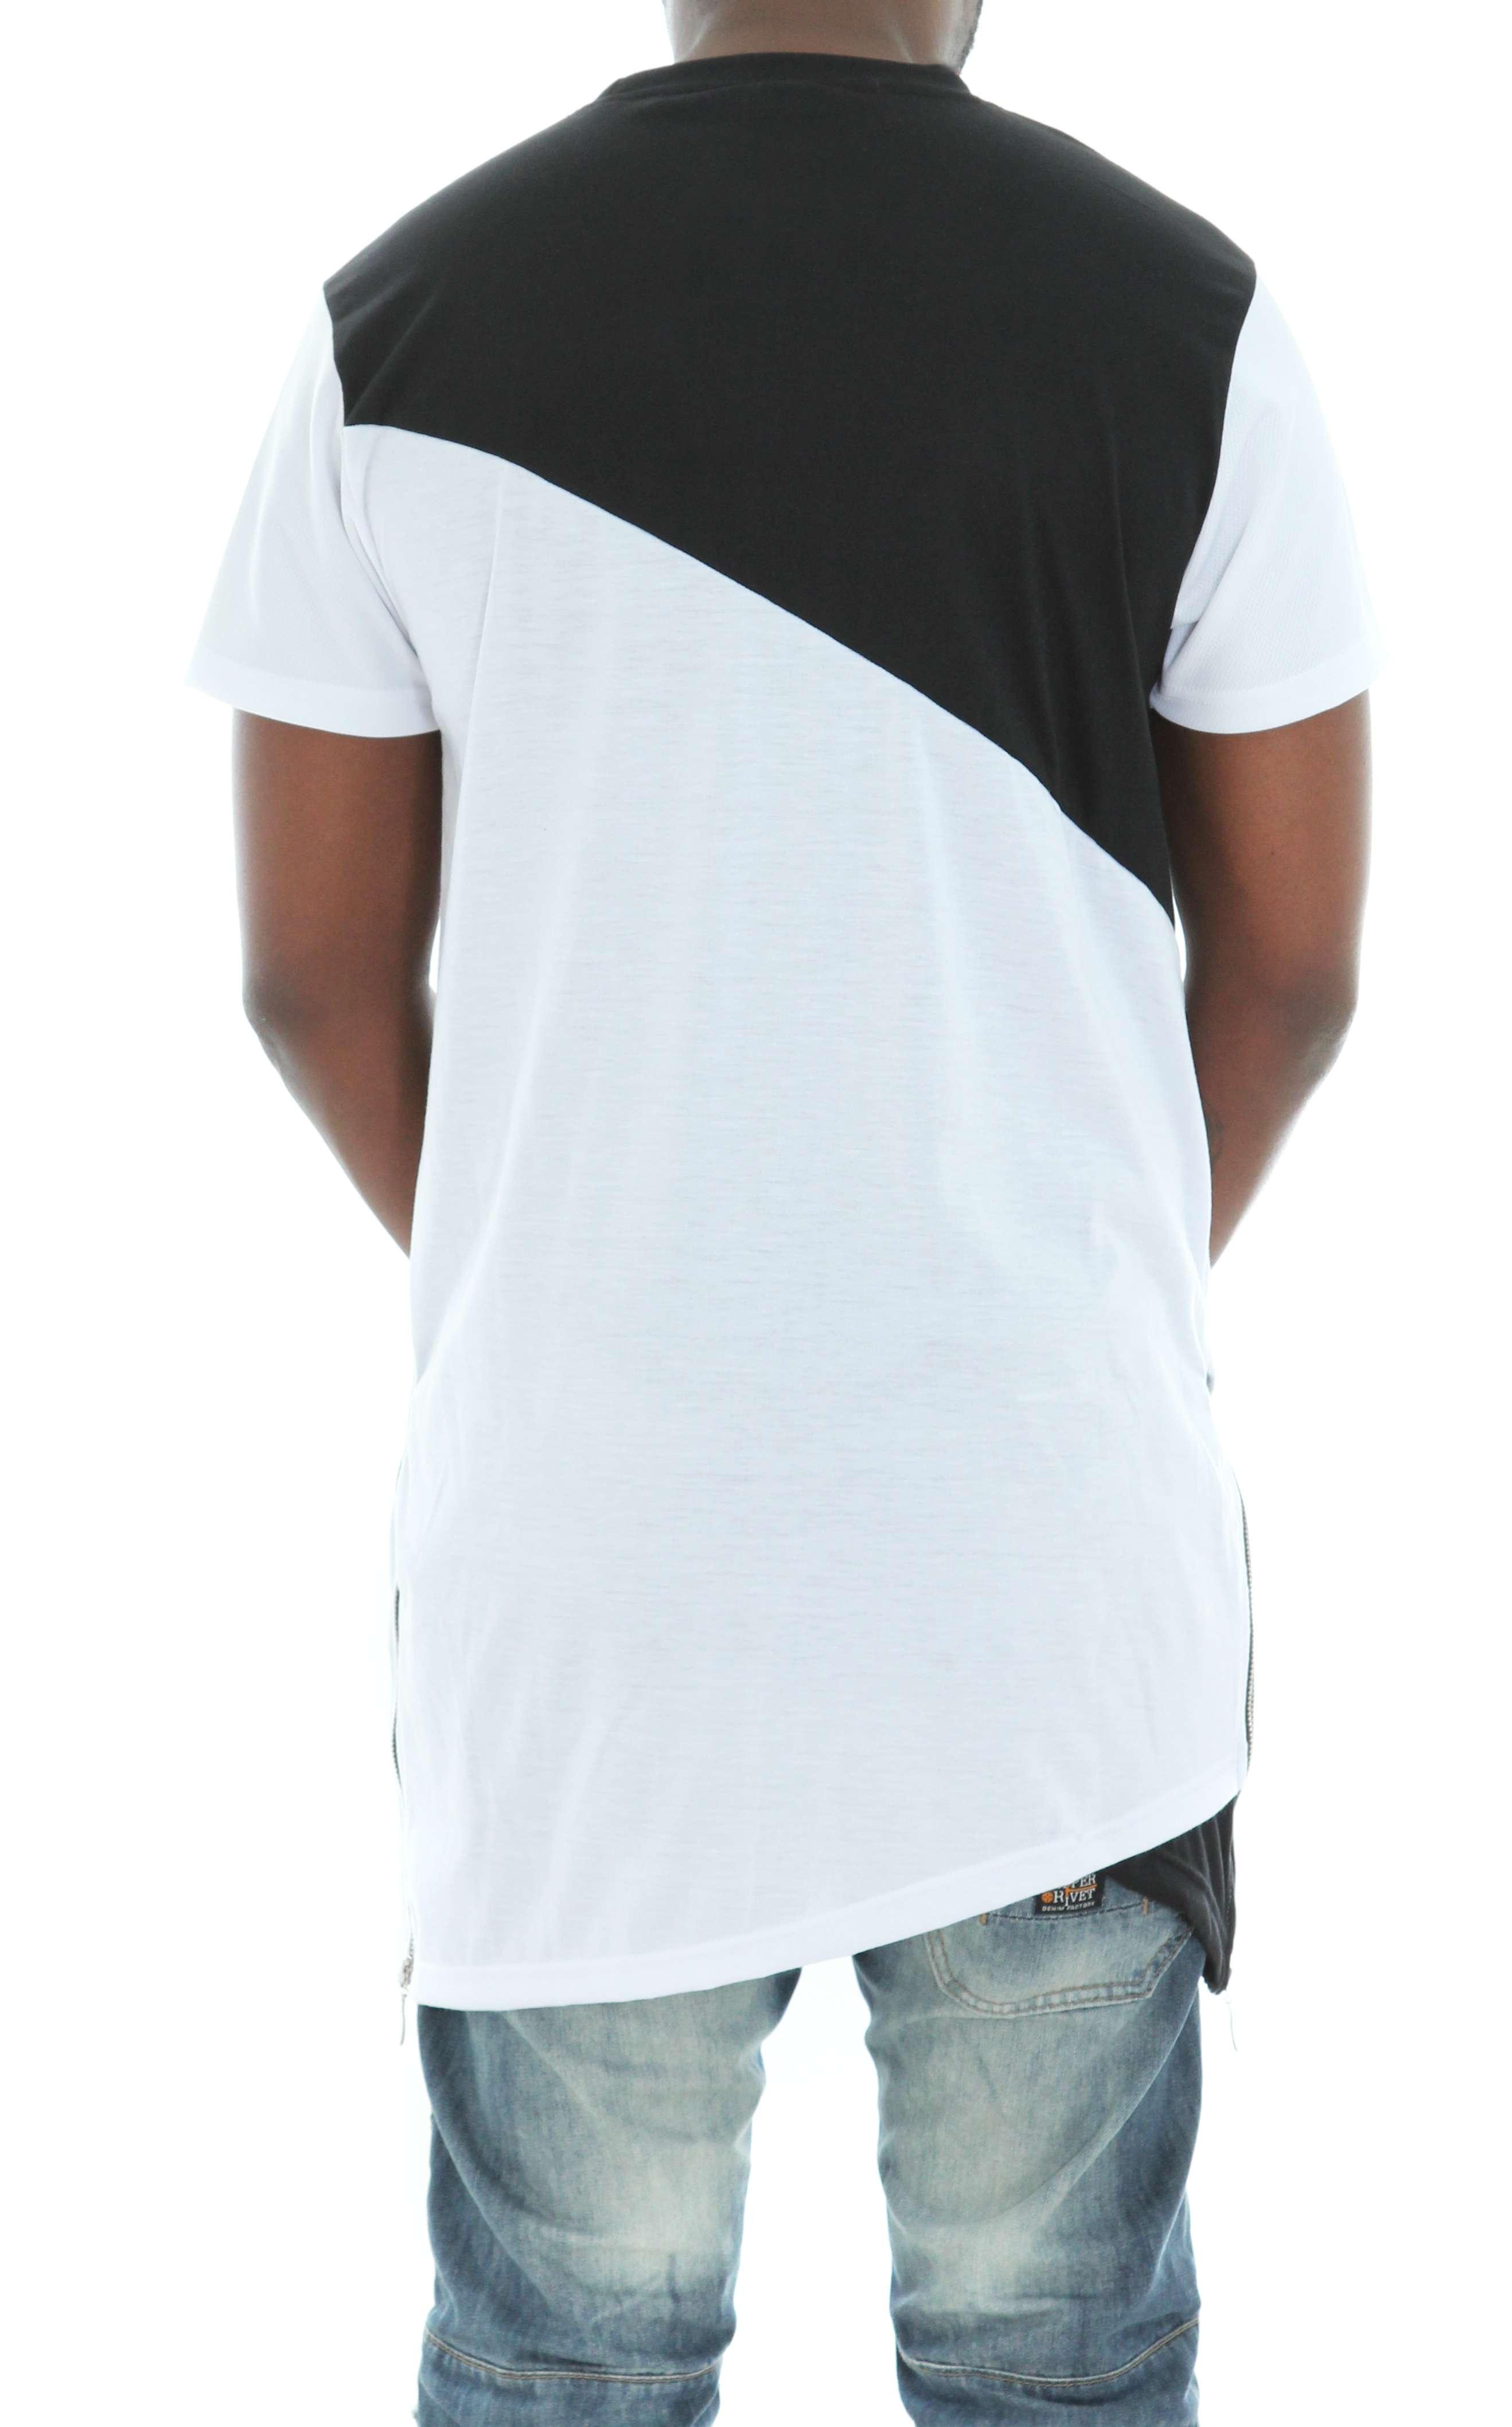 Imperious-Men-039-s-Colorblock-Asymmetric-Hem-Side-Zipper-Longline-T-Shirt thumbnail 16